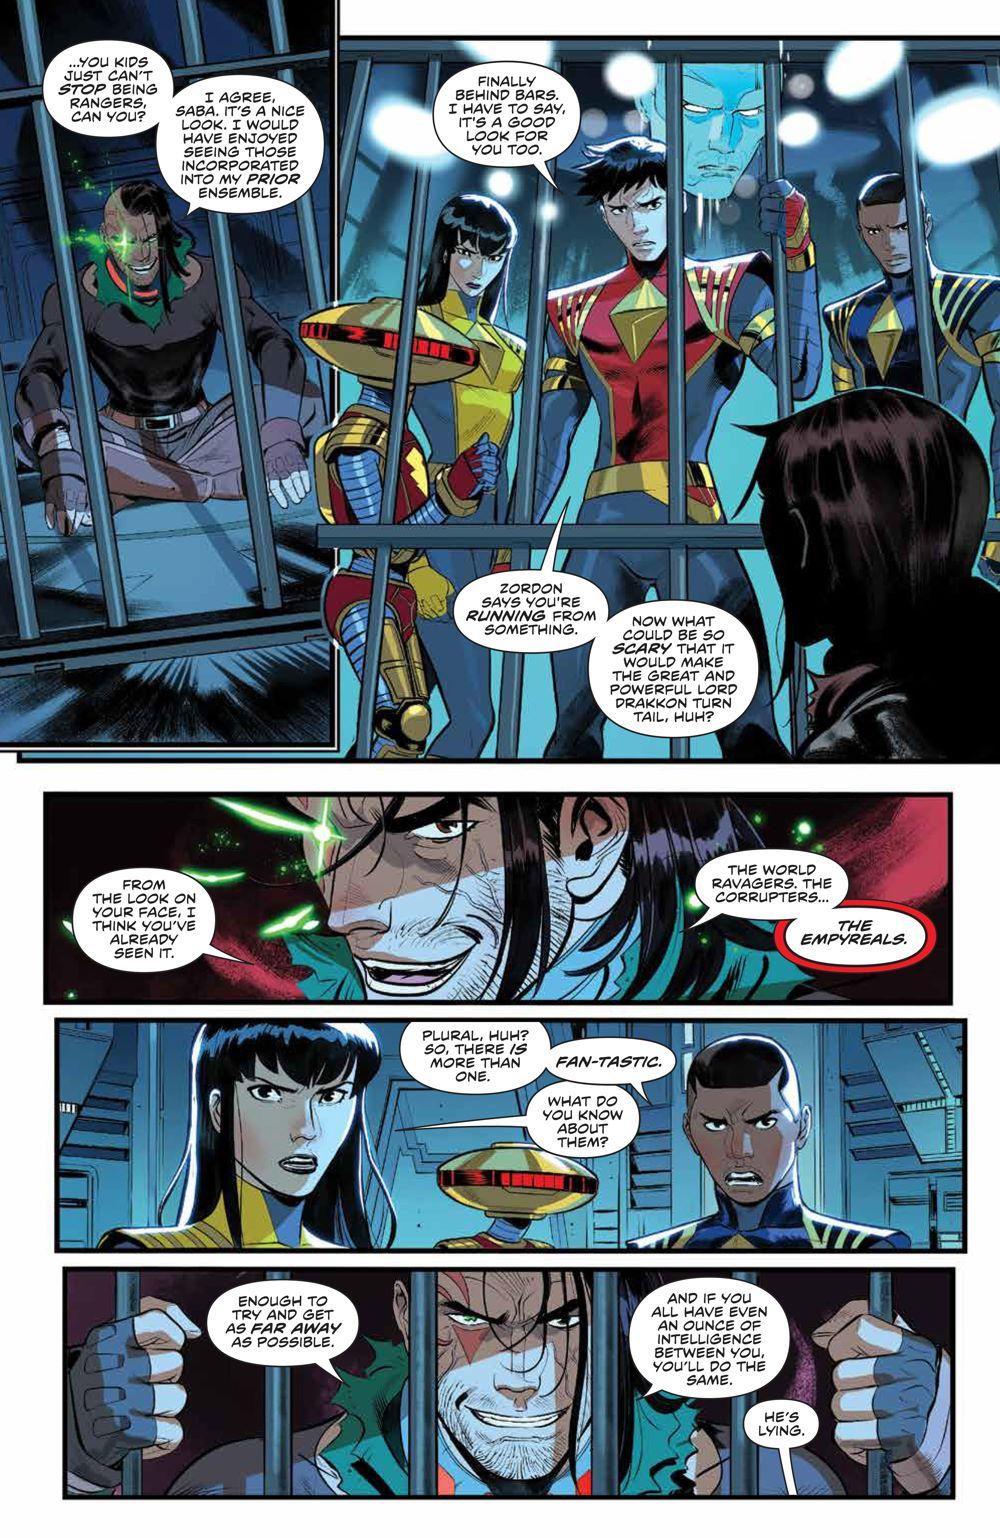 PowerRangers_v1_SC_PRESS_15 ComicList Previews: POWER RANGERS VOLUME 1 TP